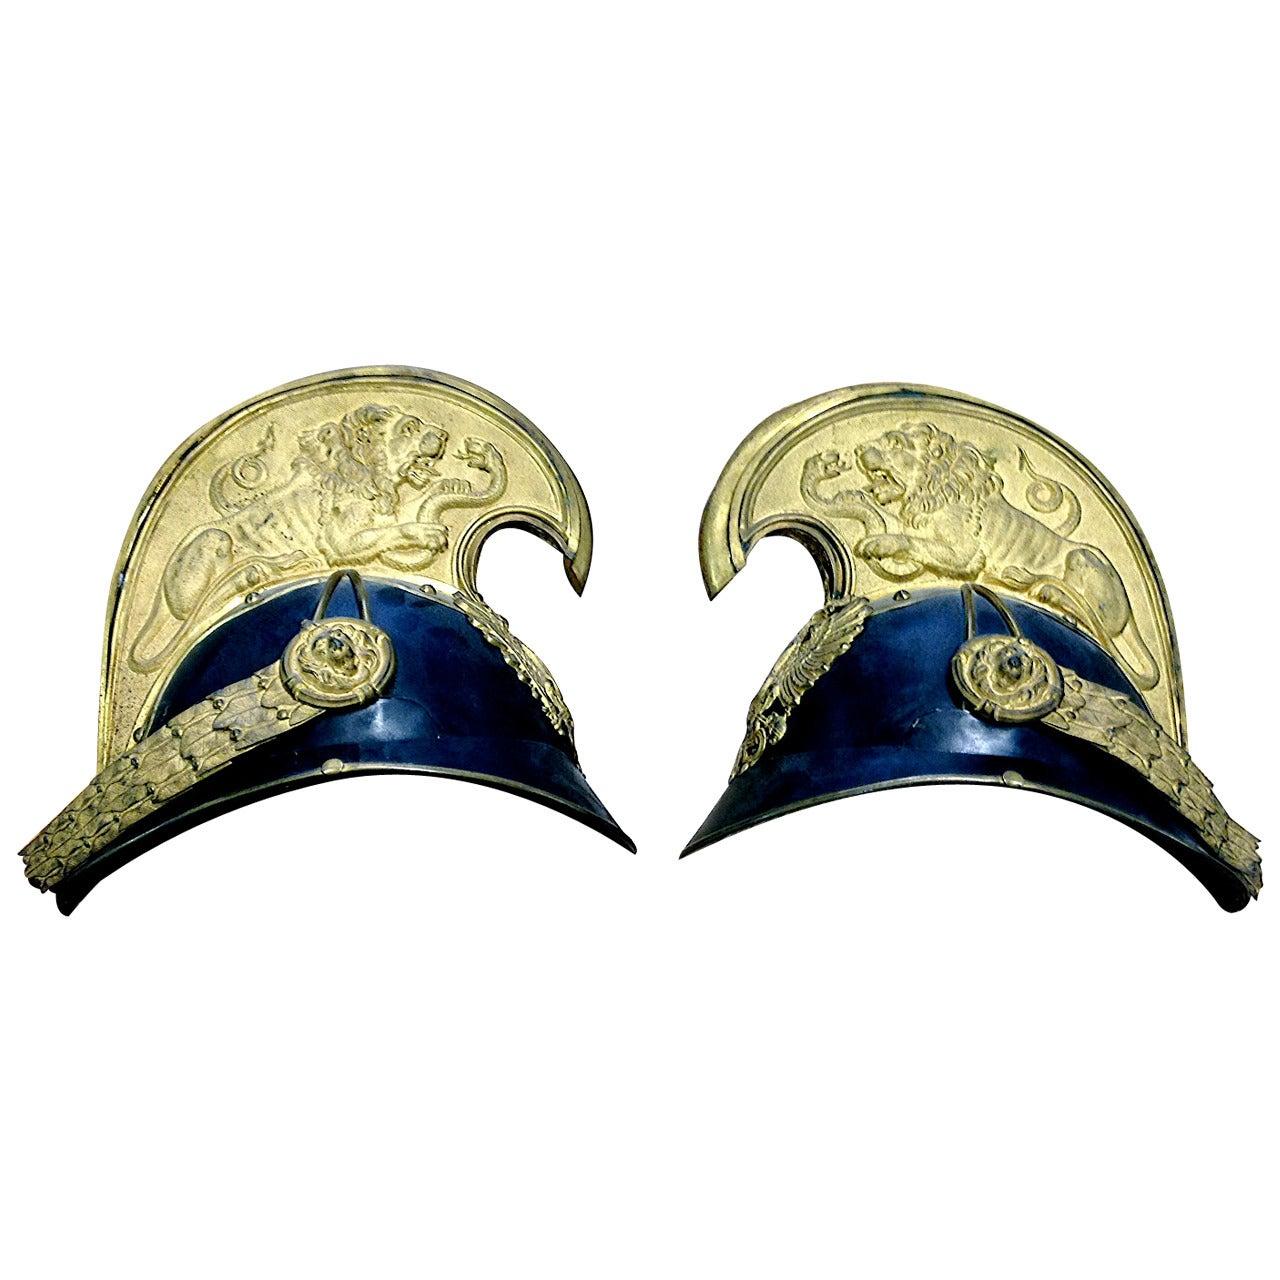 19th Century Austrian Helmet